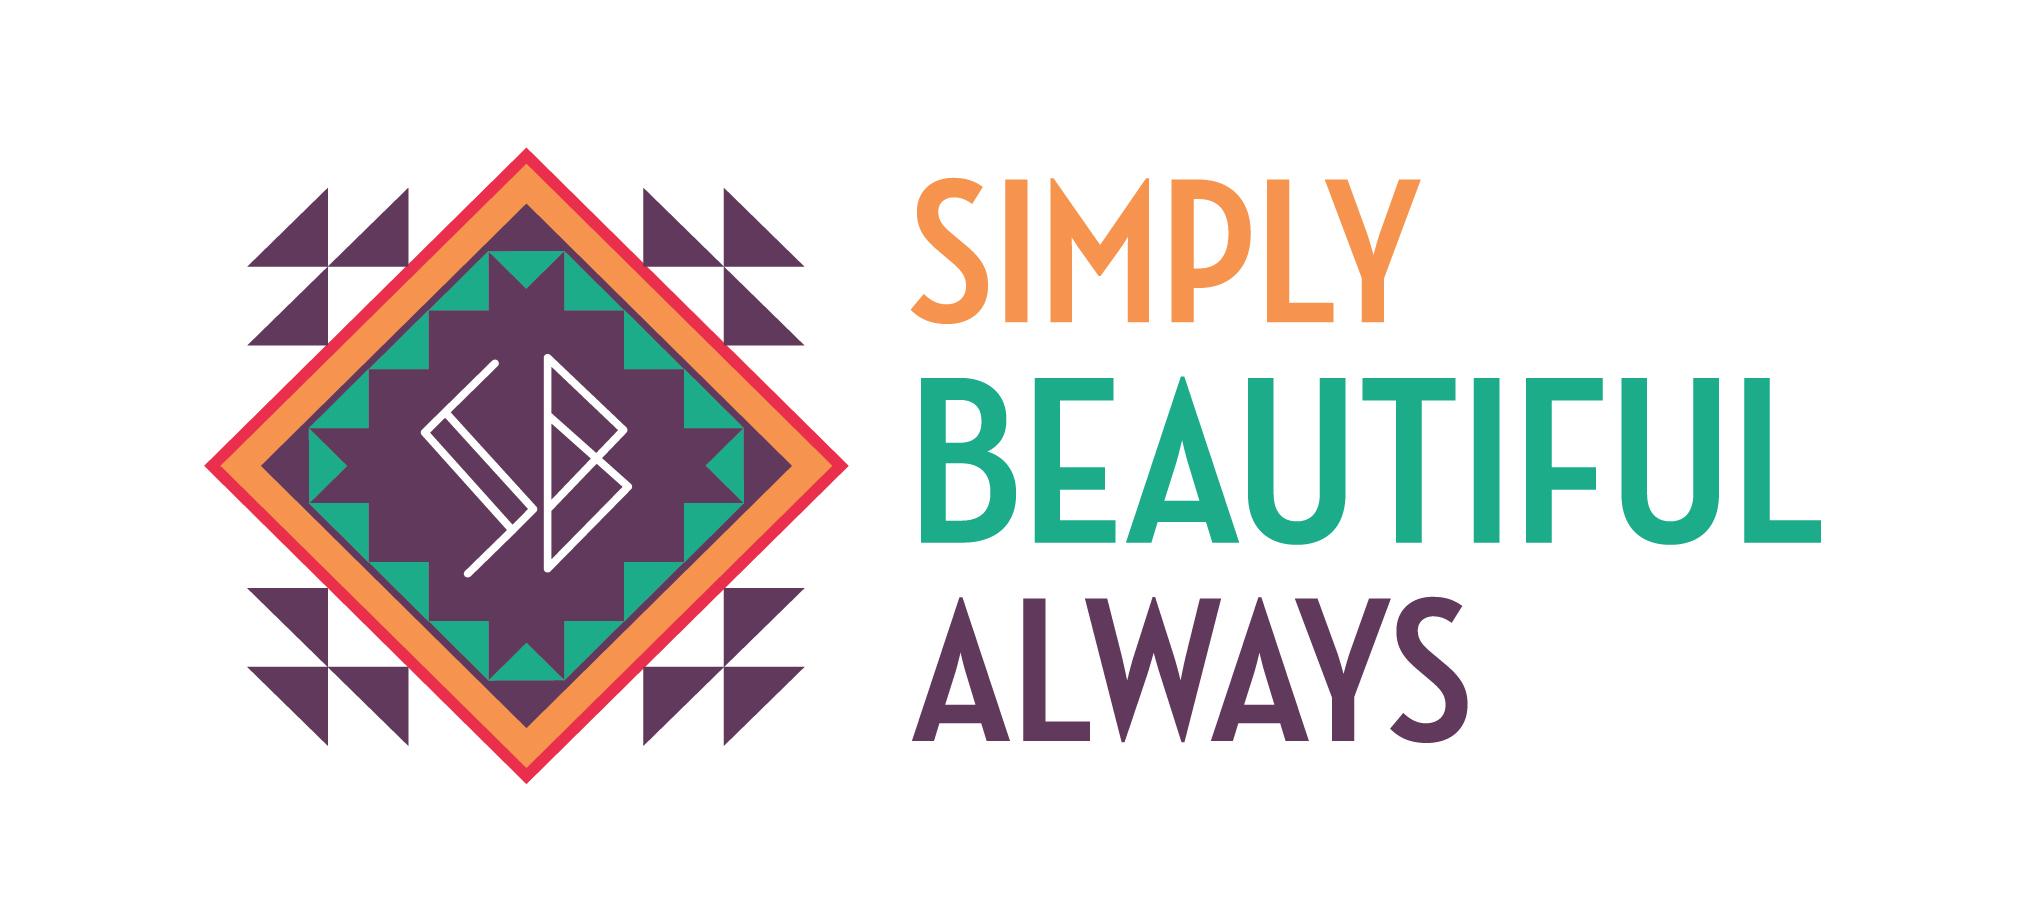 Simply beautiful always